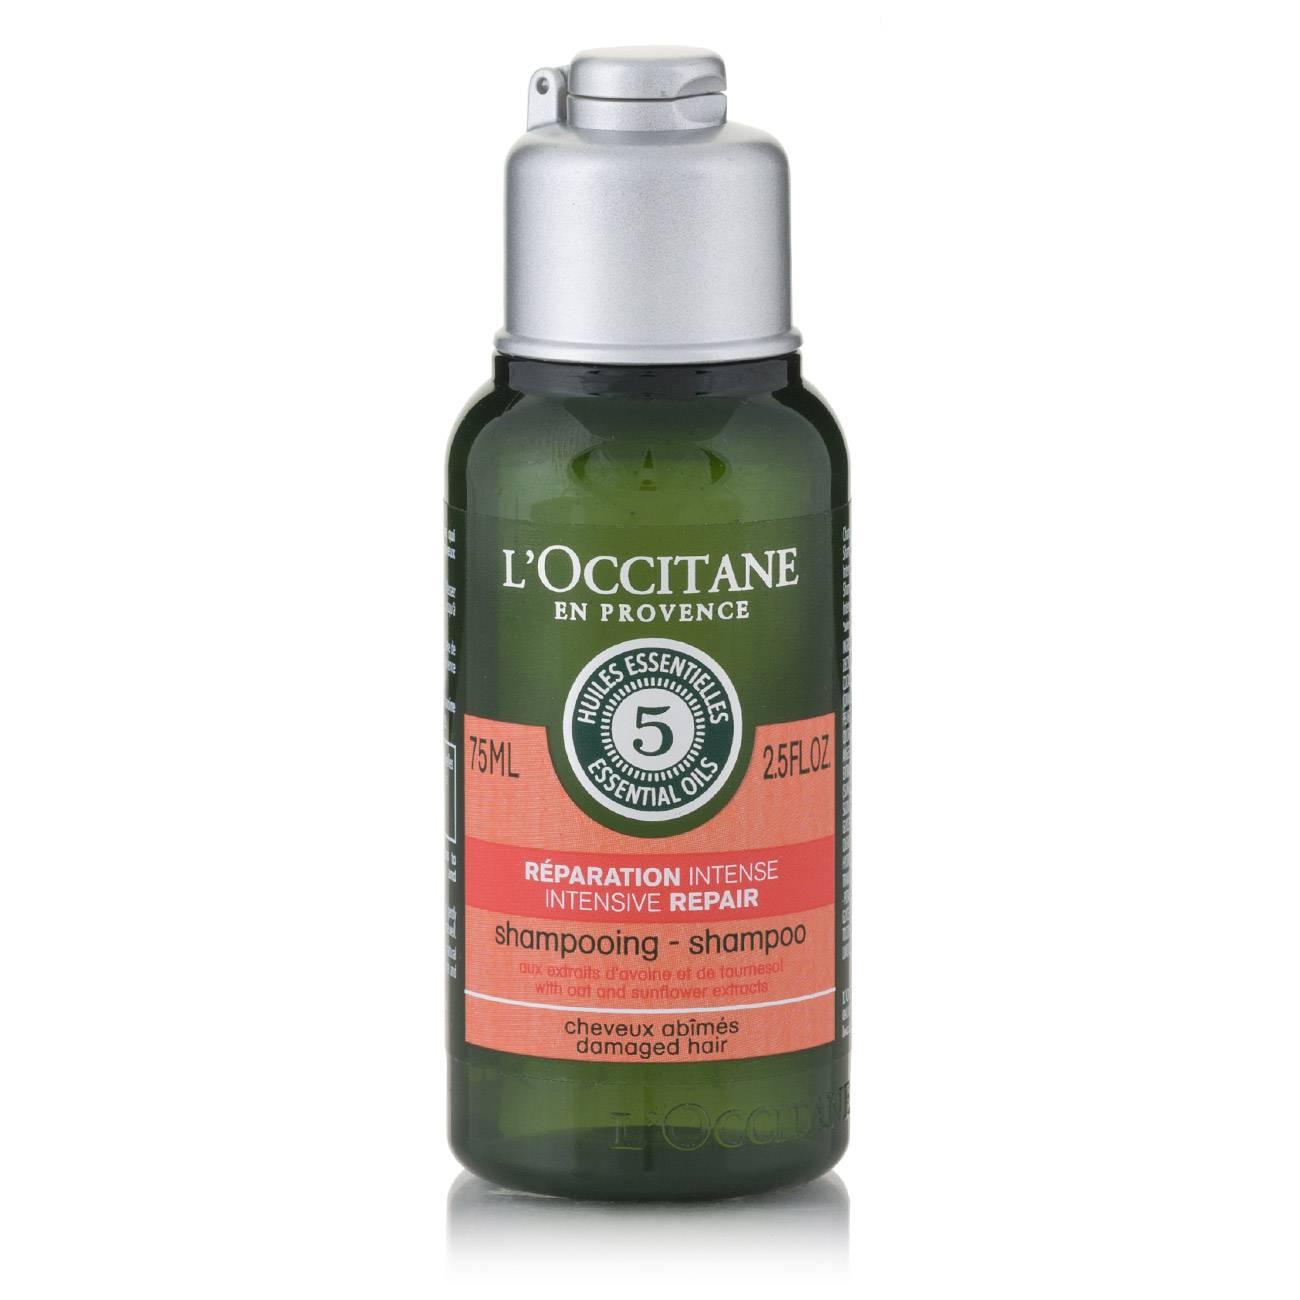 Aromachology Repair Shampoo 75ml L'occitane imagine 2021 bestvalue.eu